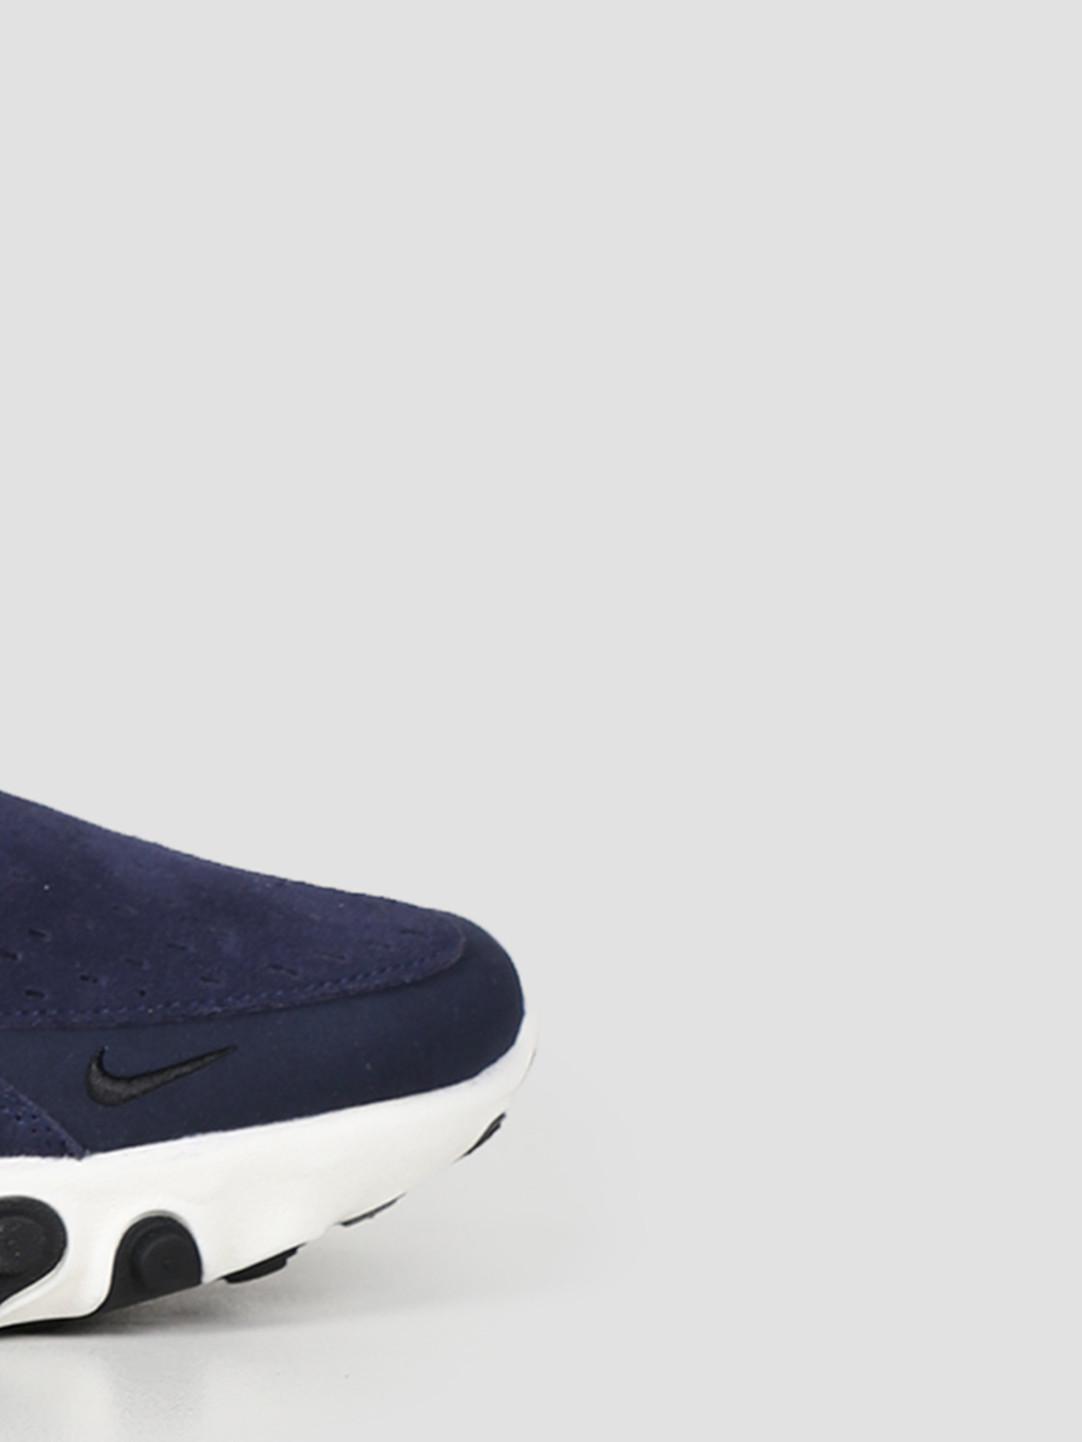 Nike Nike React Sertu Blackened Blue Black-Sail At5301-400